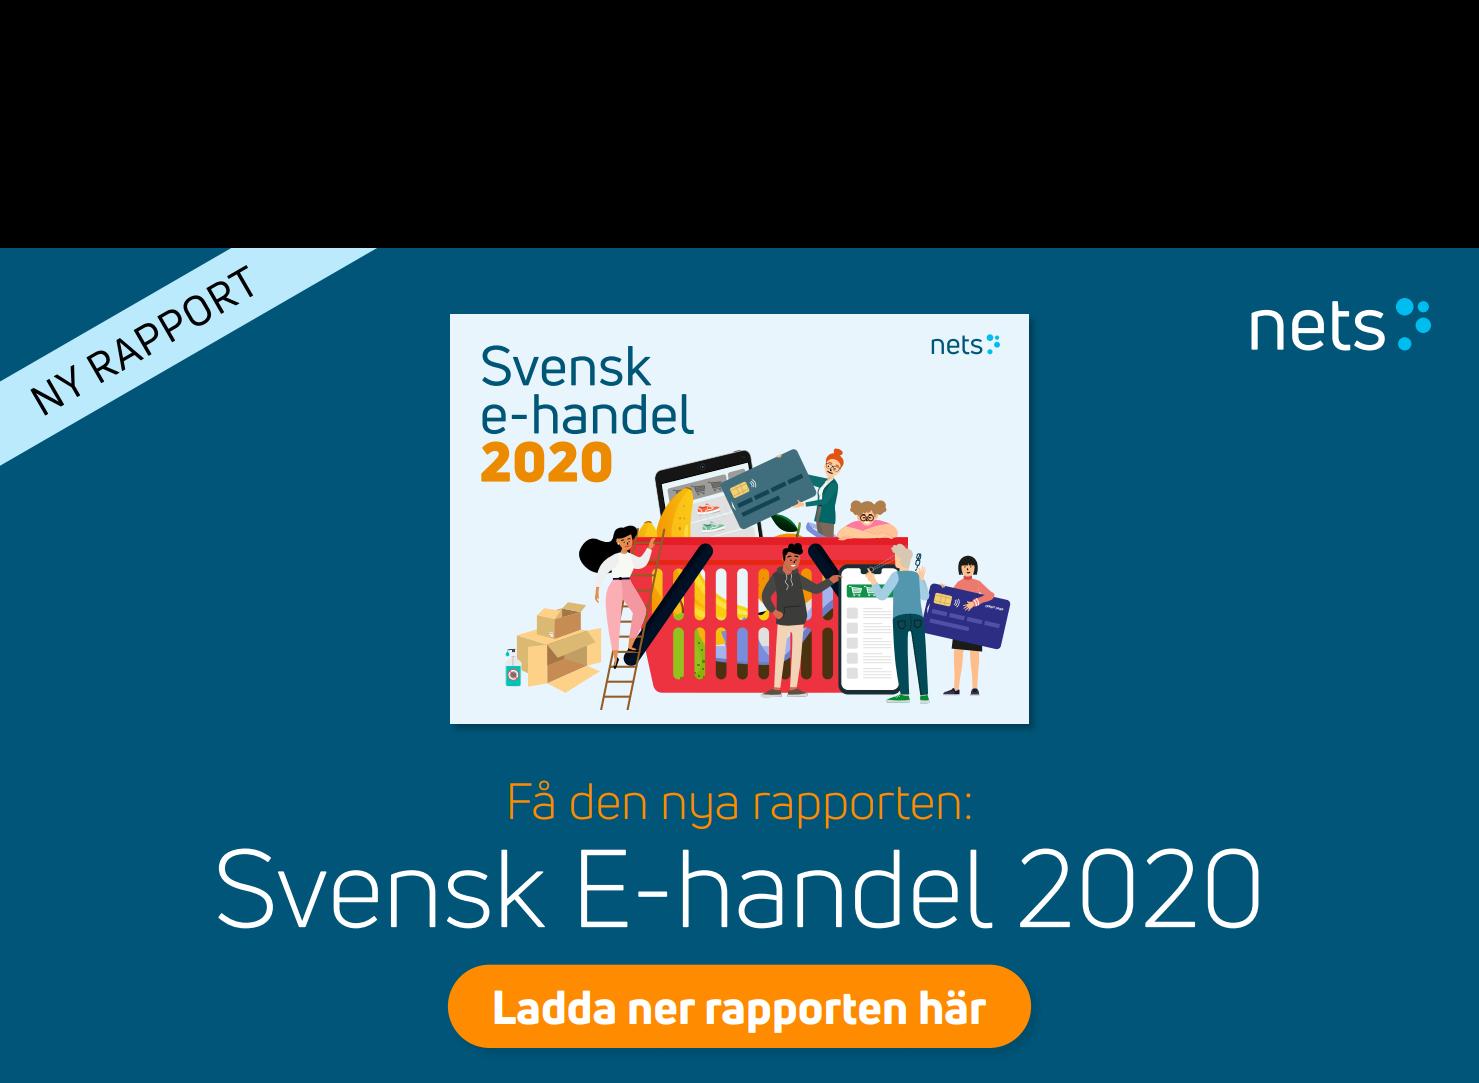 ny-rapport-svensk_e-handel